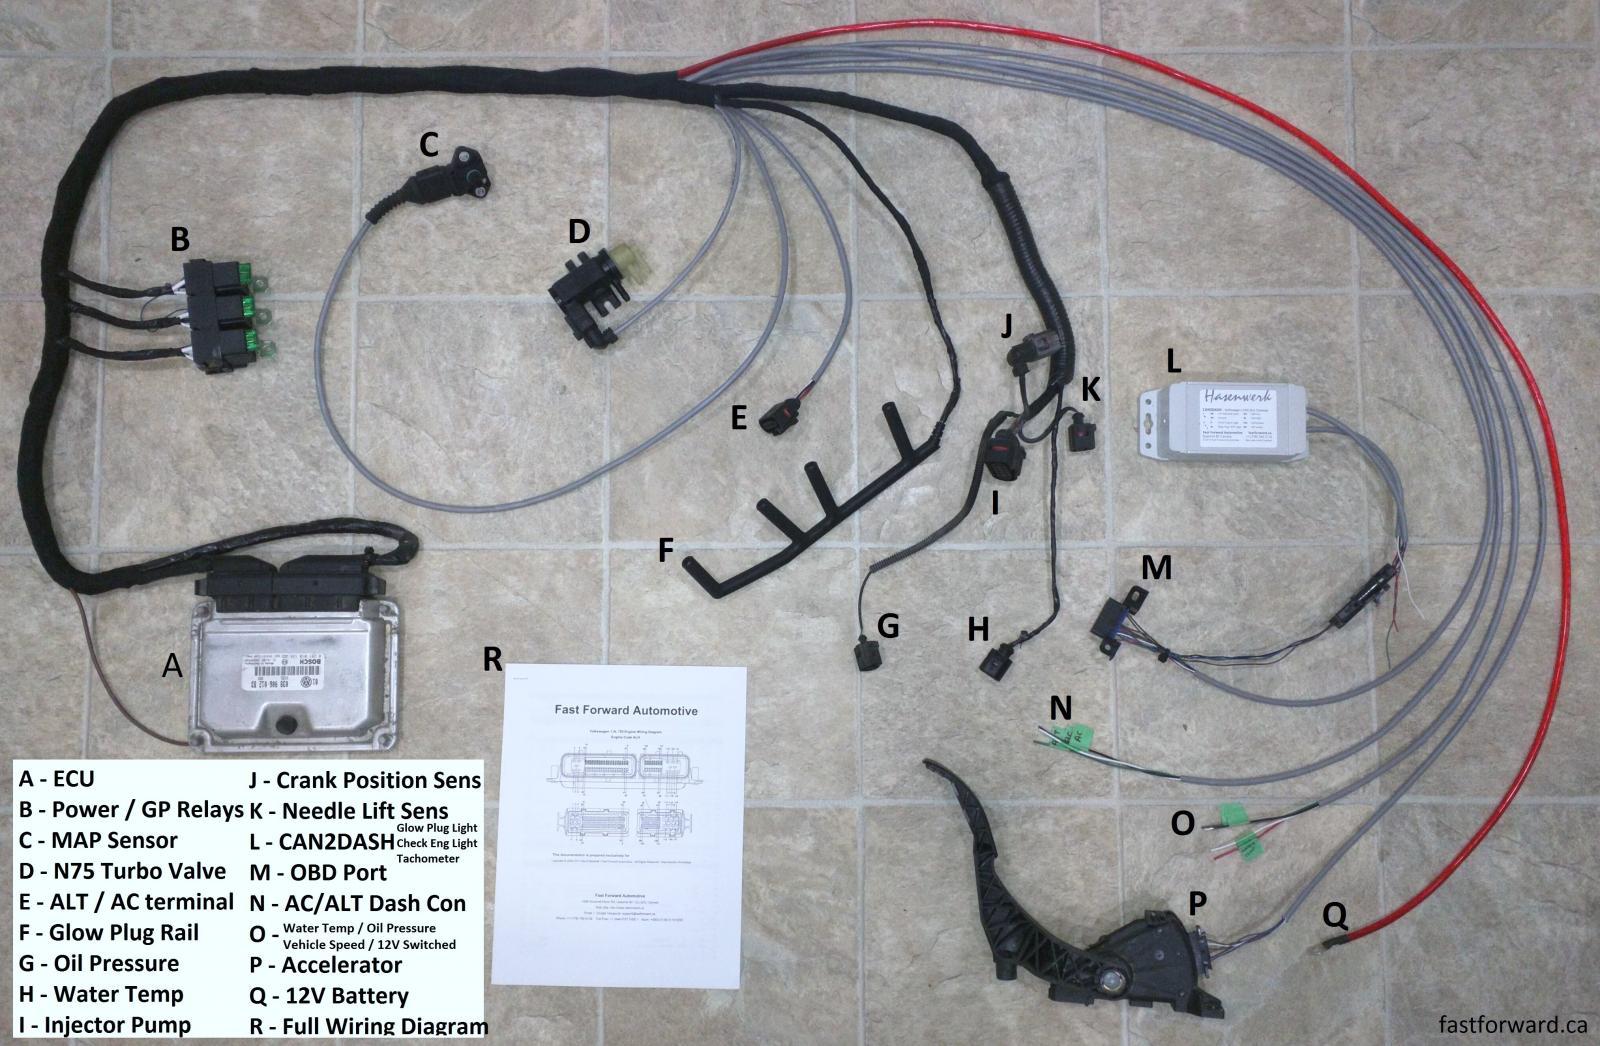 88653B Vw Tdi Glow Plug Wiring Diagram | Wiring Resources on jeep cj7 ignition wiring diagram, jeep cj7 heater wiring diagram, jeep cj7 turn signal wiring diagram, jeep cj7 dash wiring diagram, jeep cj7 wiper wiring diagram,